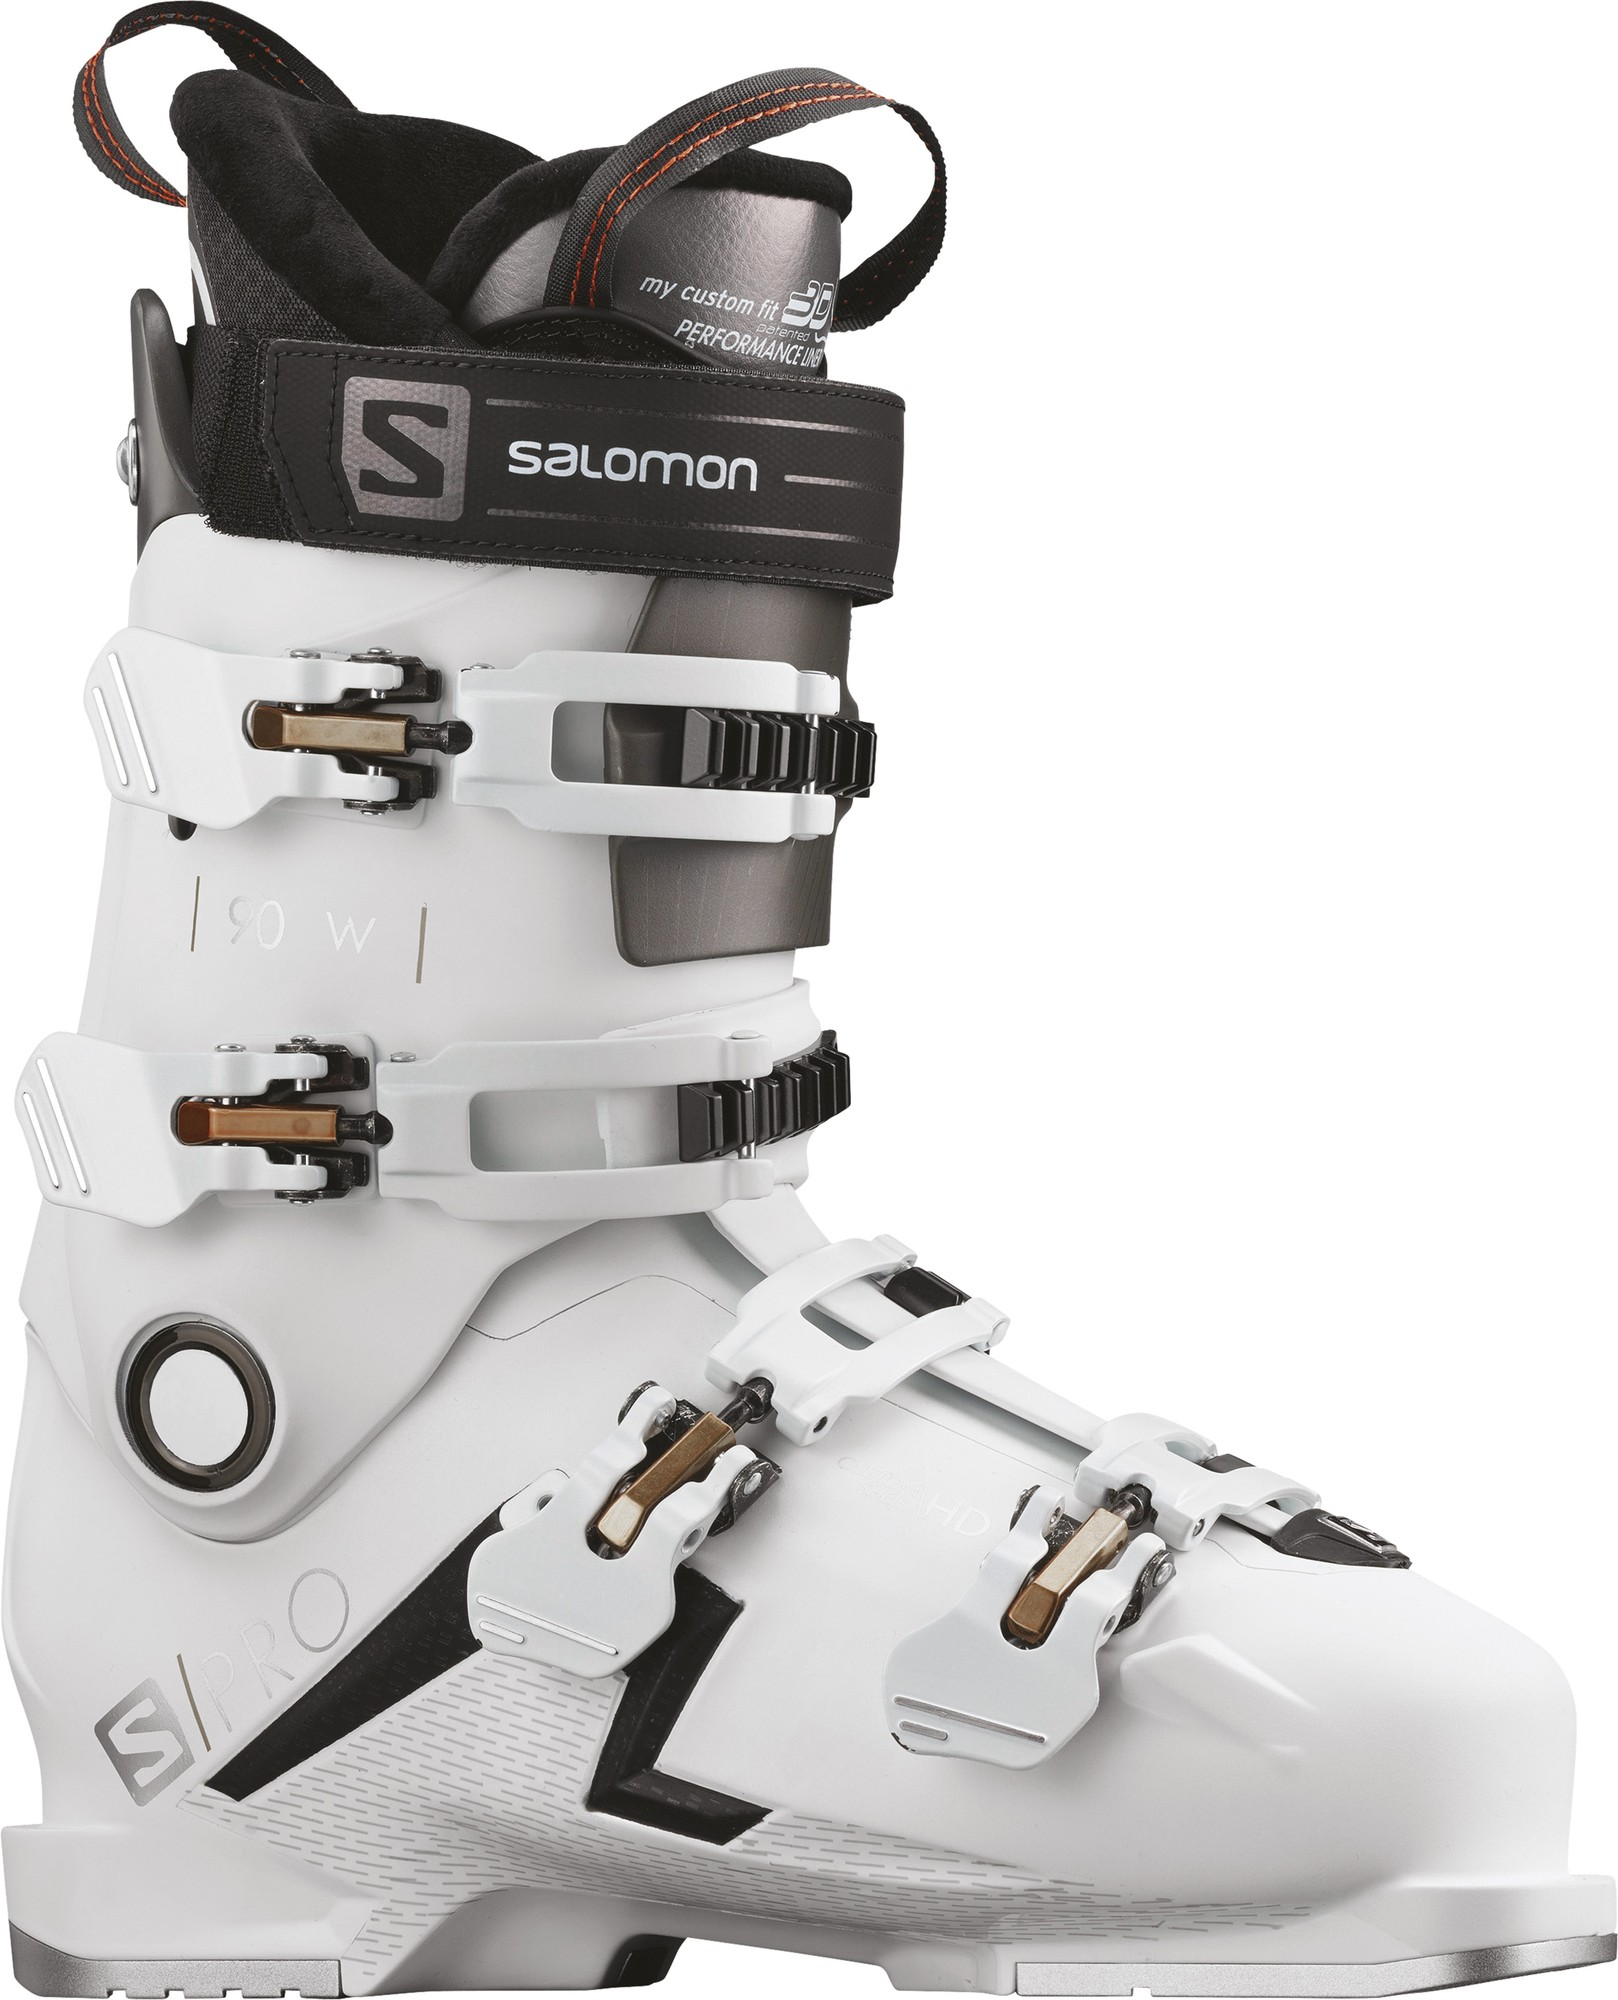 Salomon Ботинки горнолыжные женские Salomon S/PRO 90, размер 26 см женские пуховики куртки new brand 90